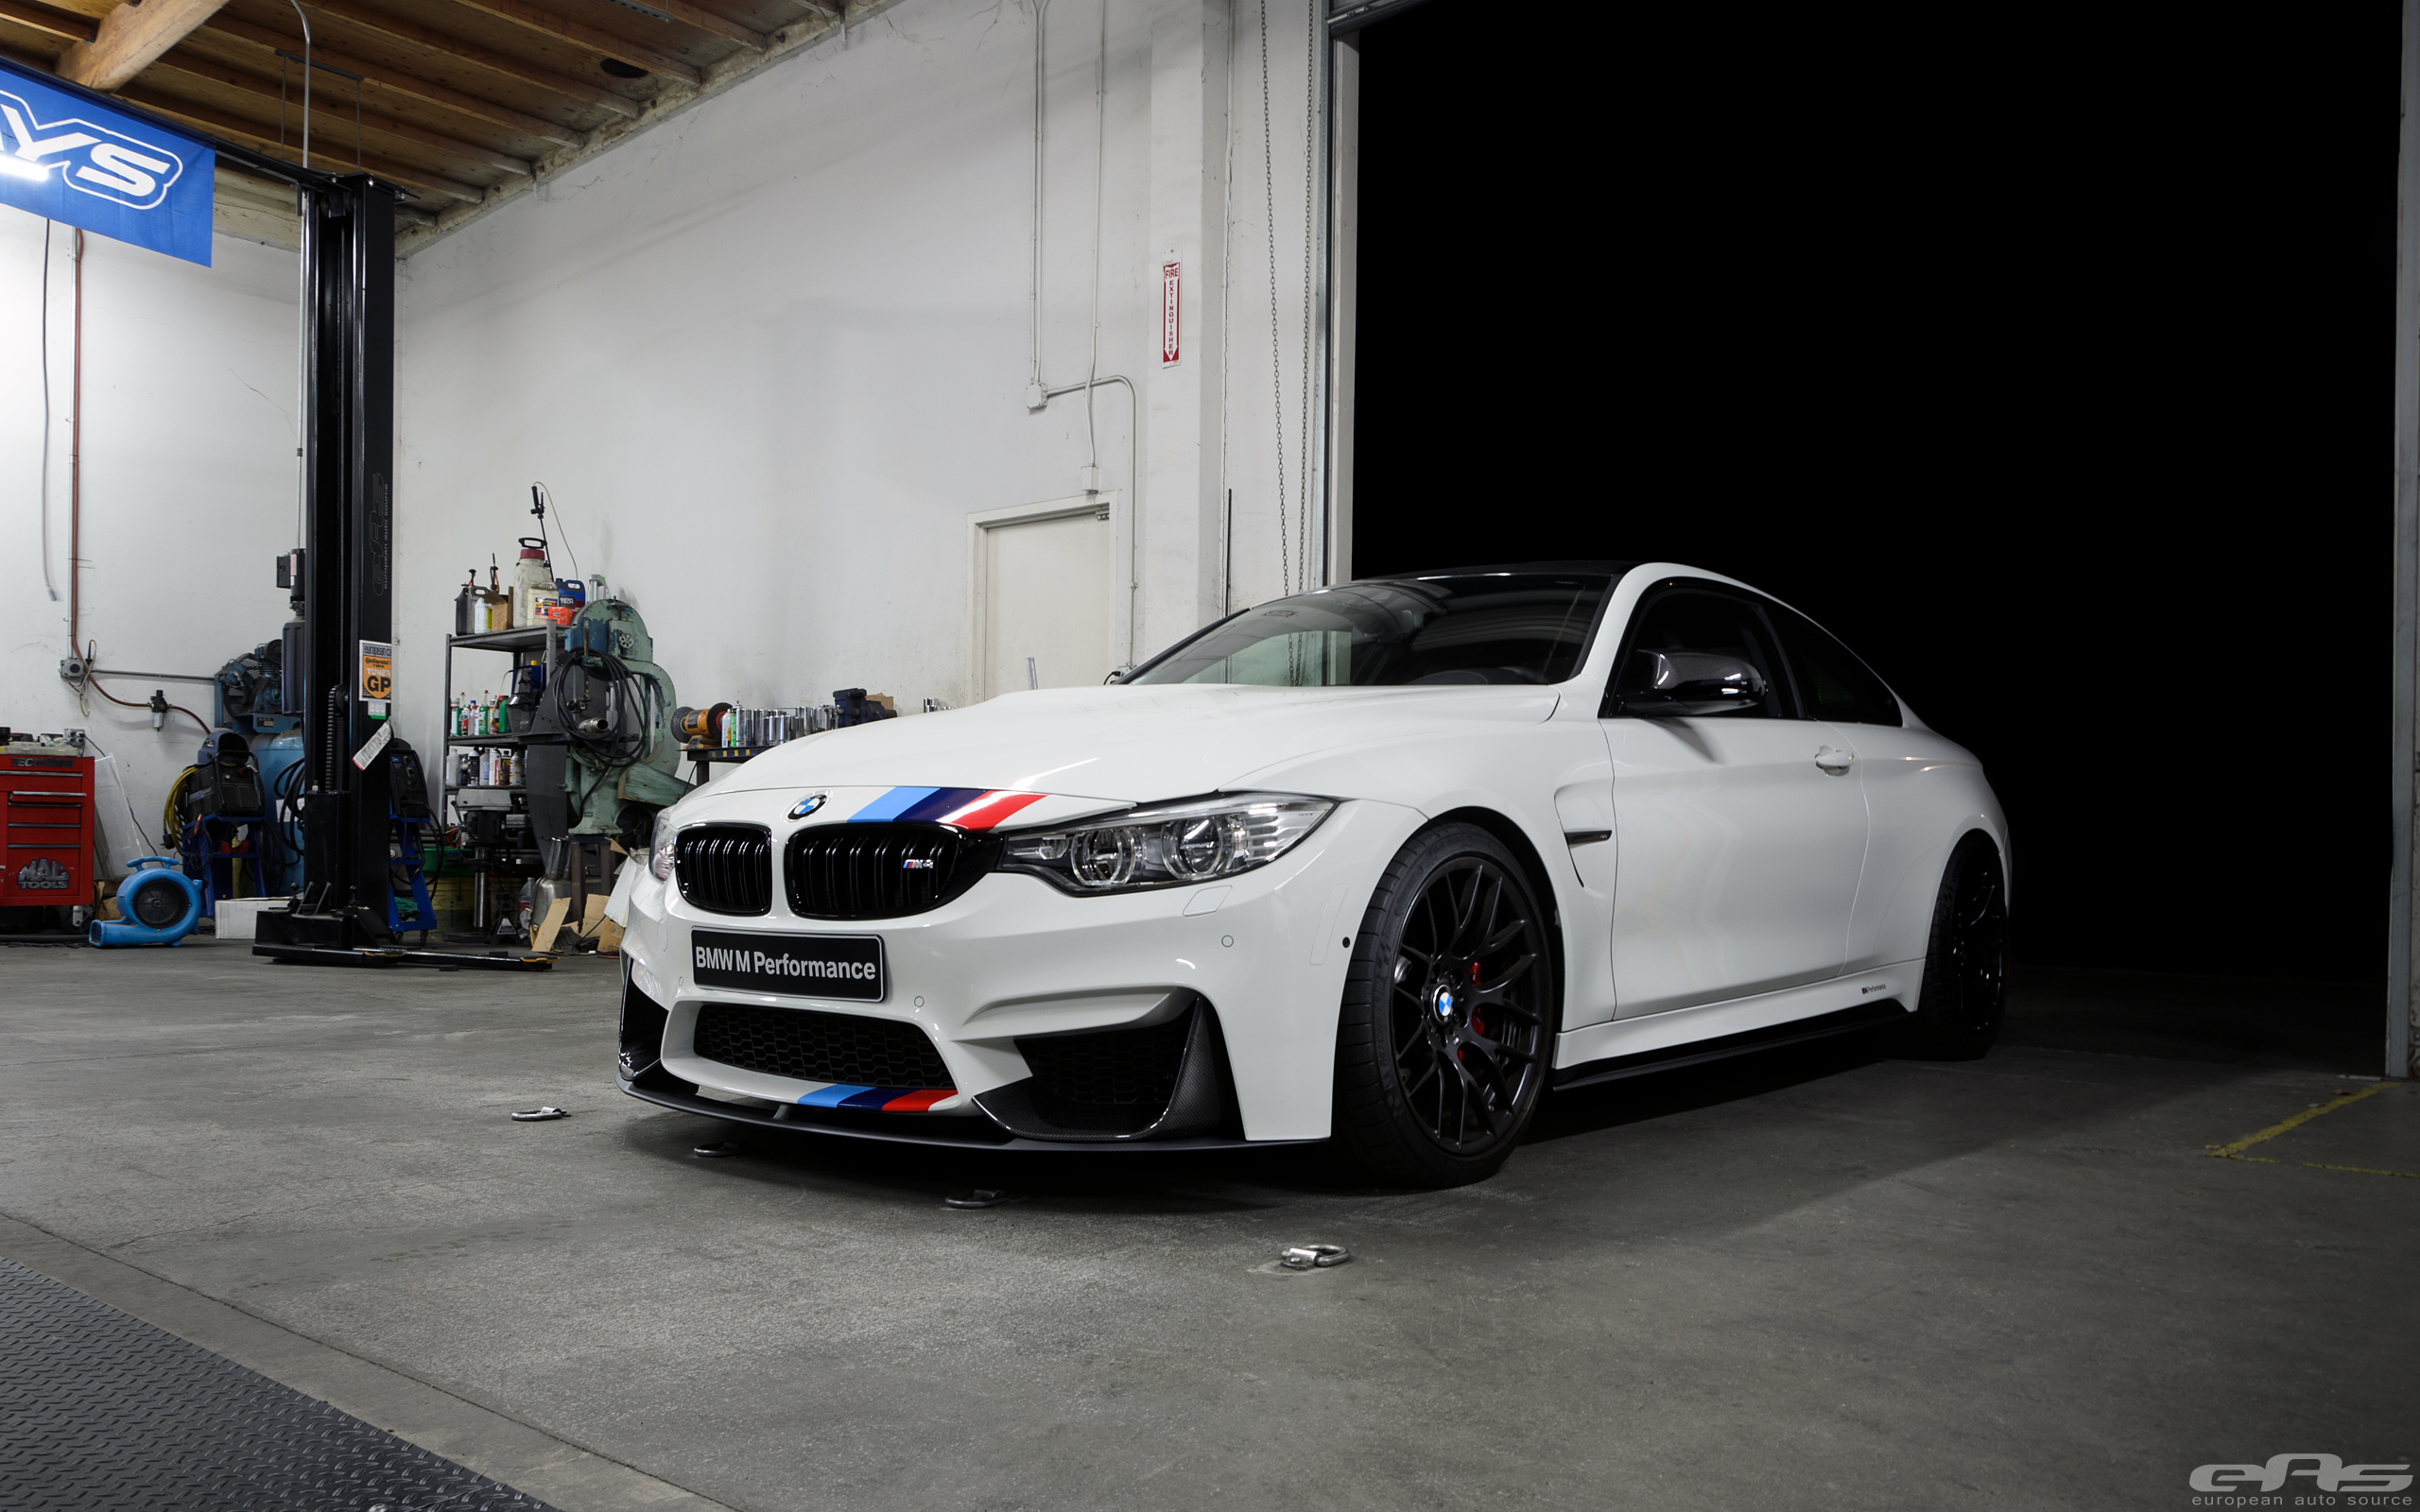 Alpine White Bmw M4 Featured In Bmw S Stand At Sema Was